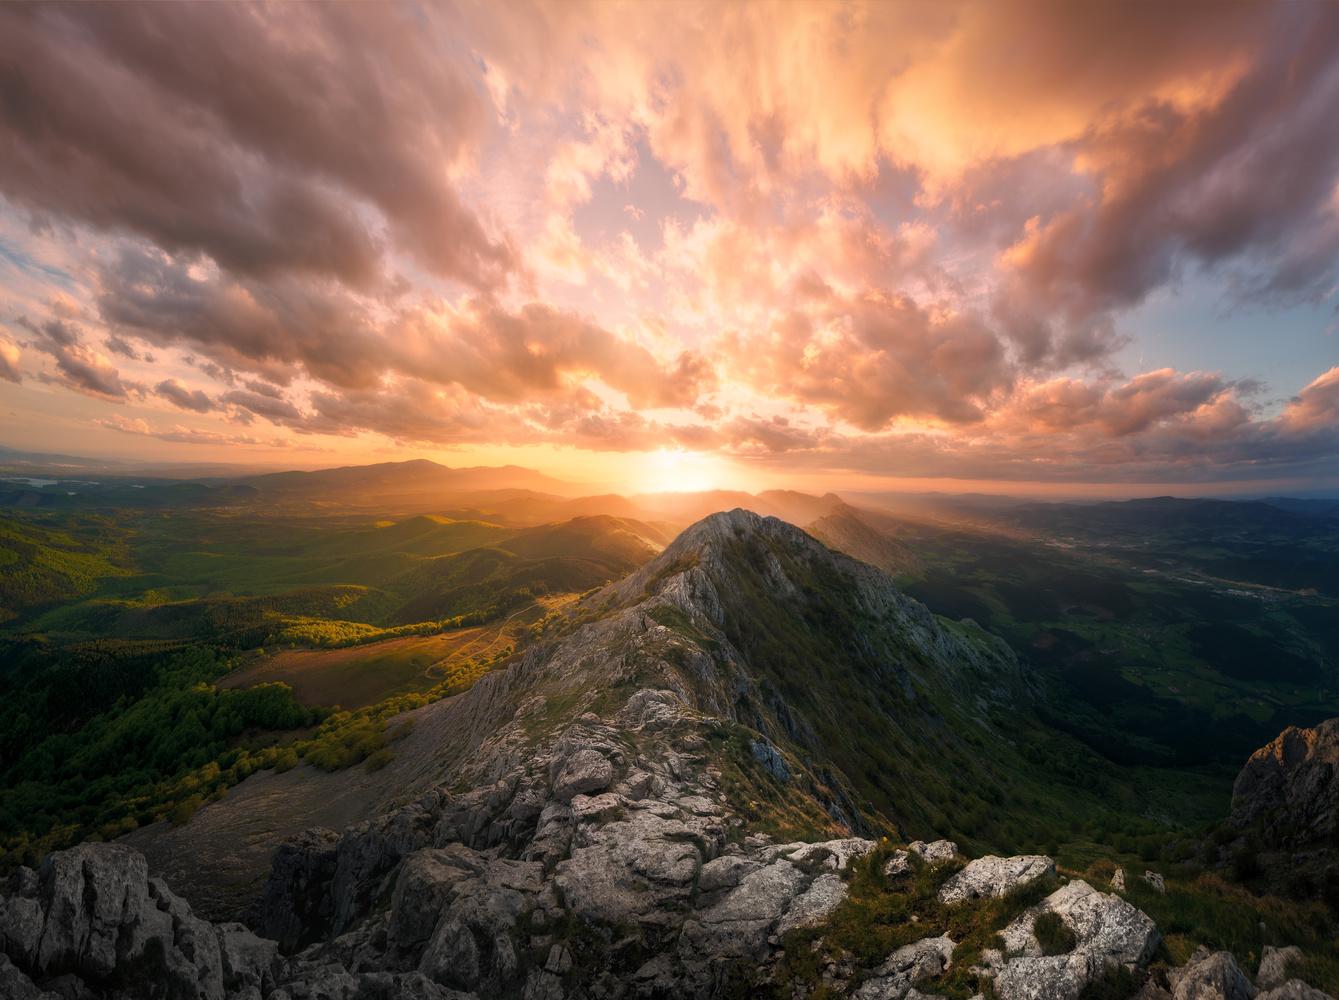 Anboto peak by Eneko Guerra